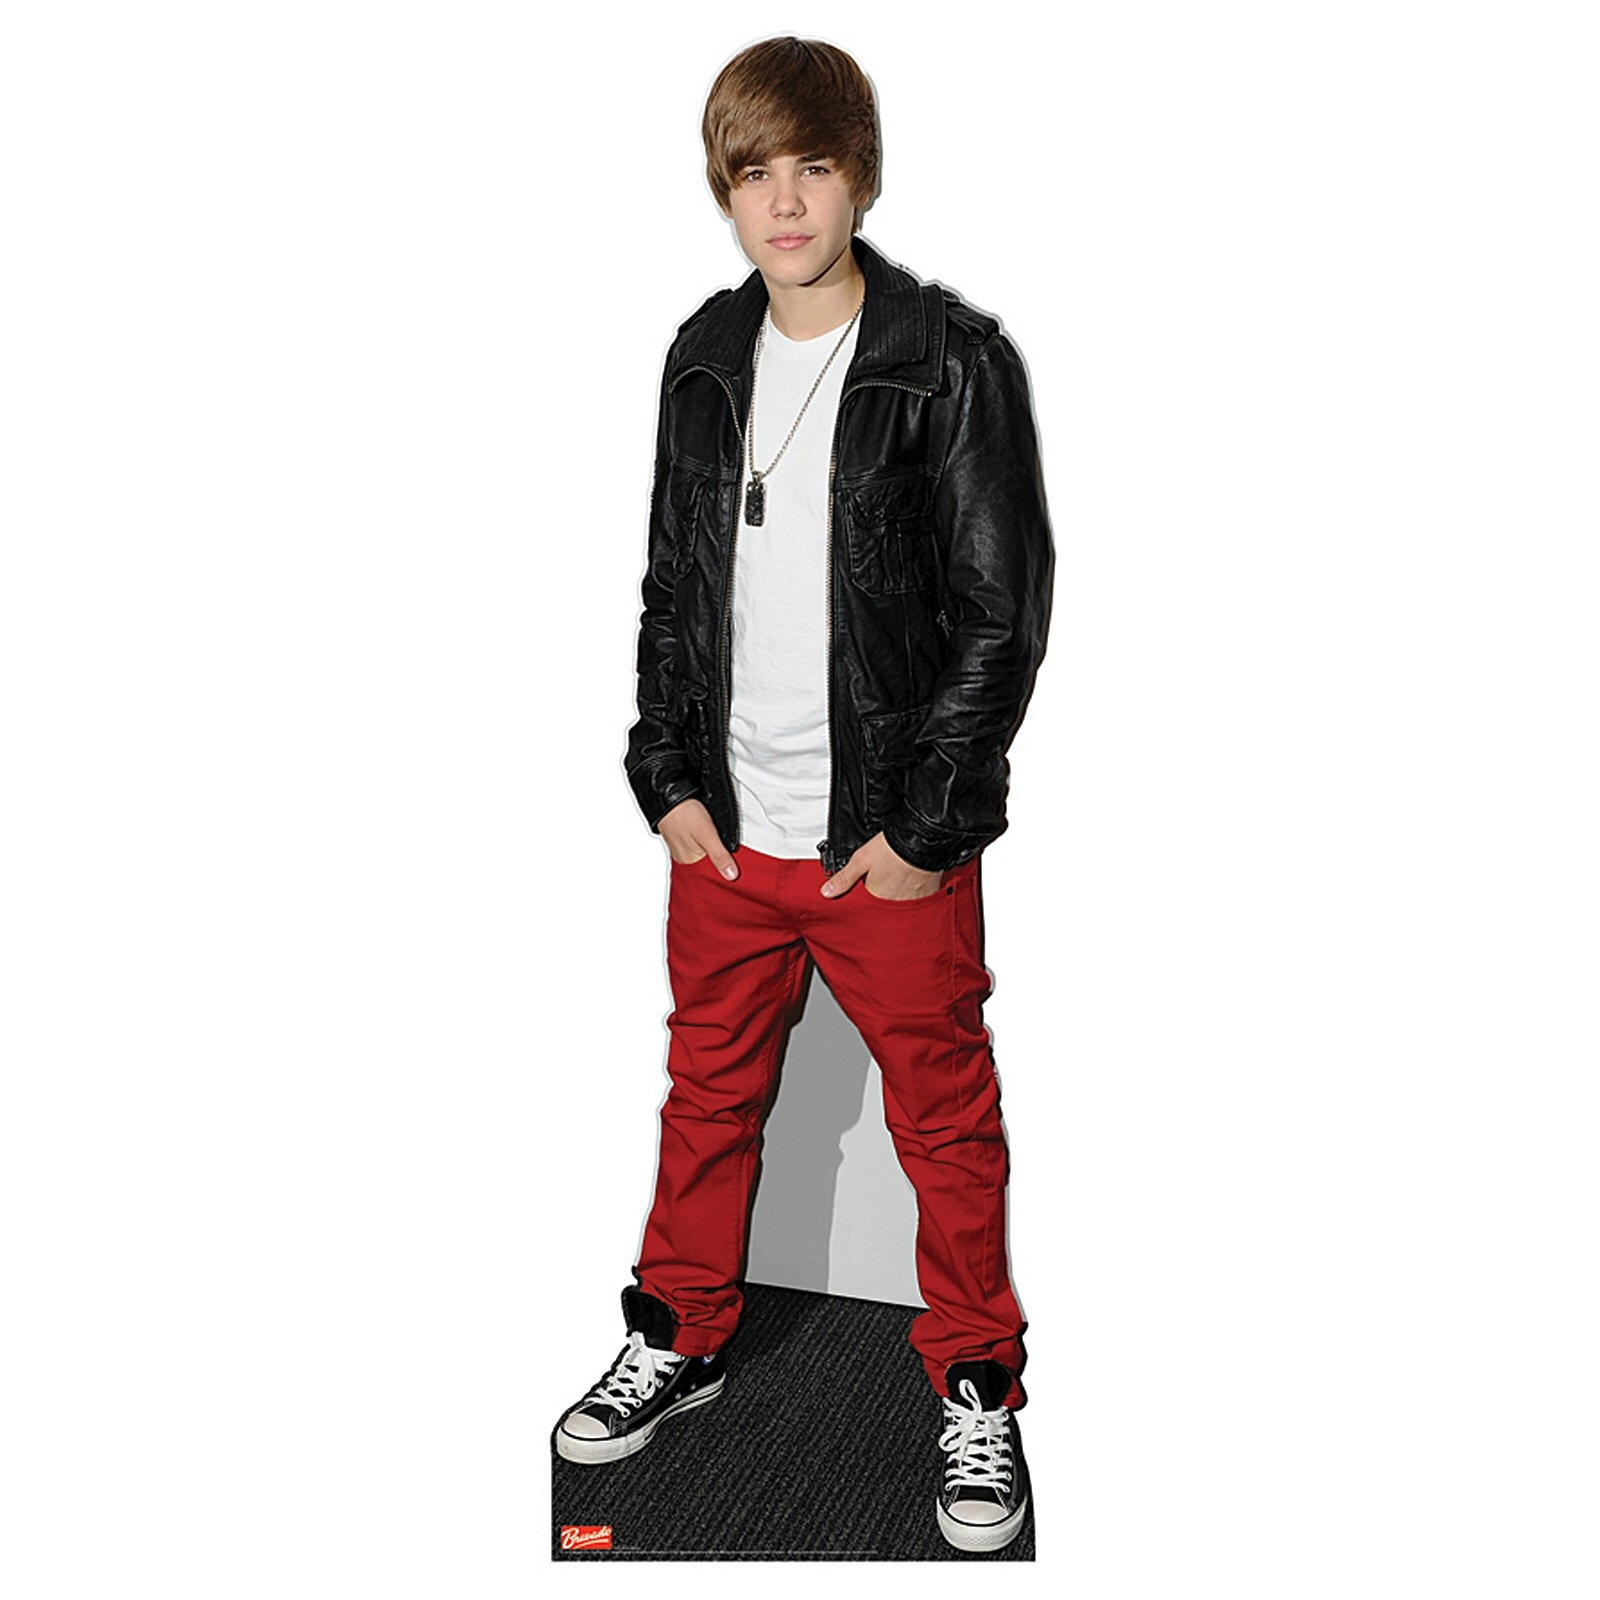 Celebrity Fitness Tips: Selena Gomez And Justin Bieber